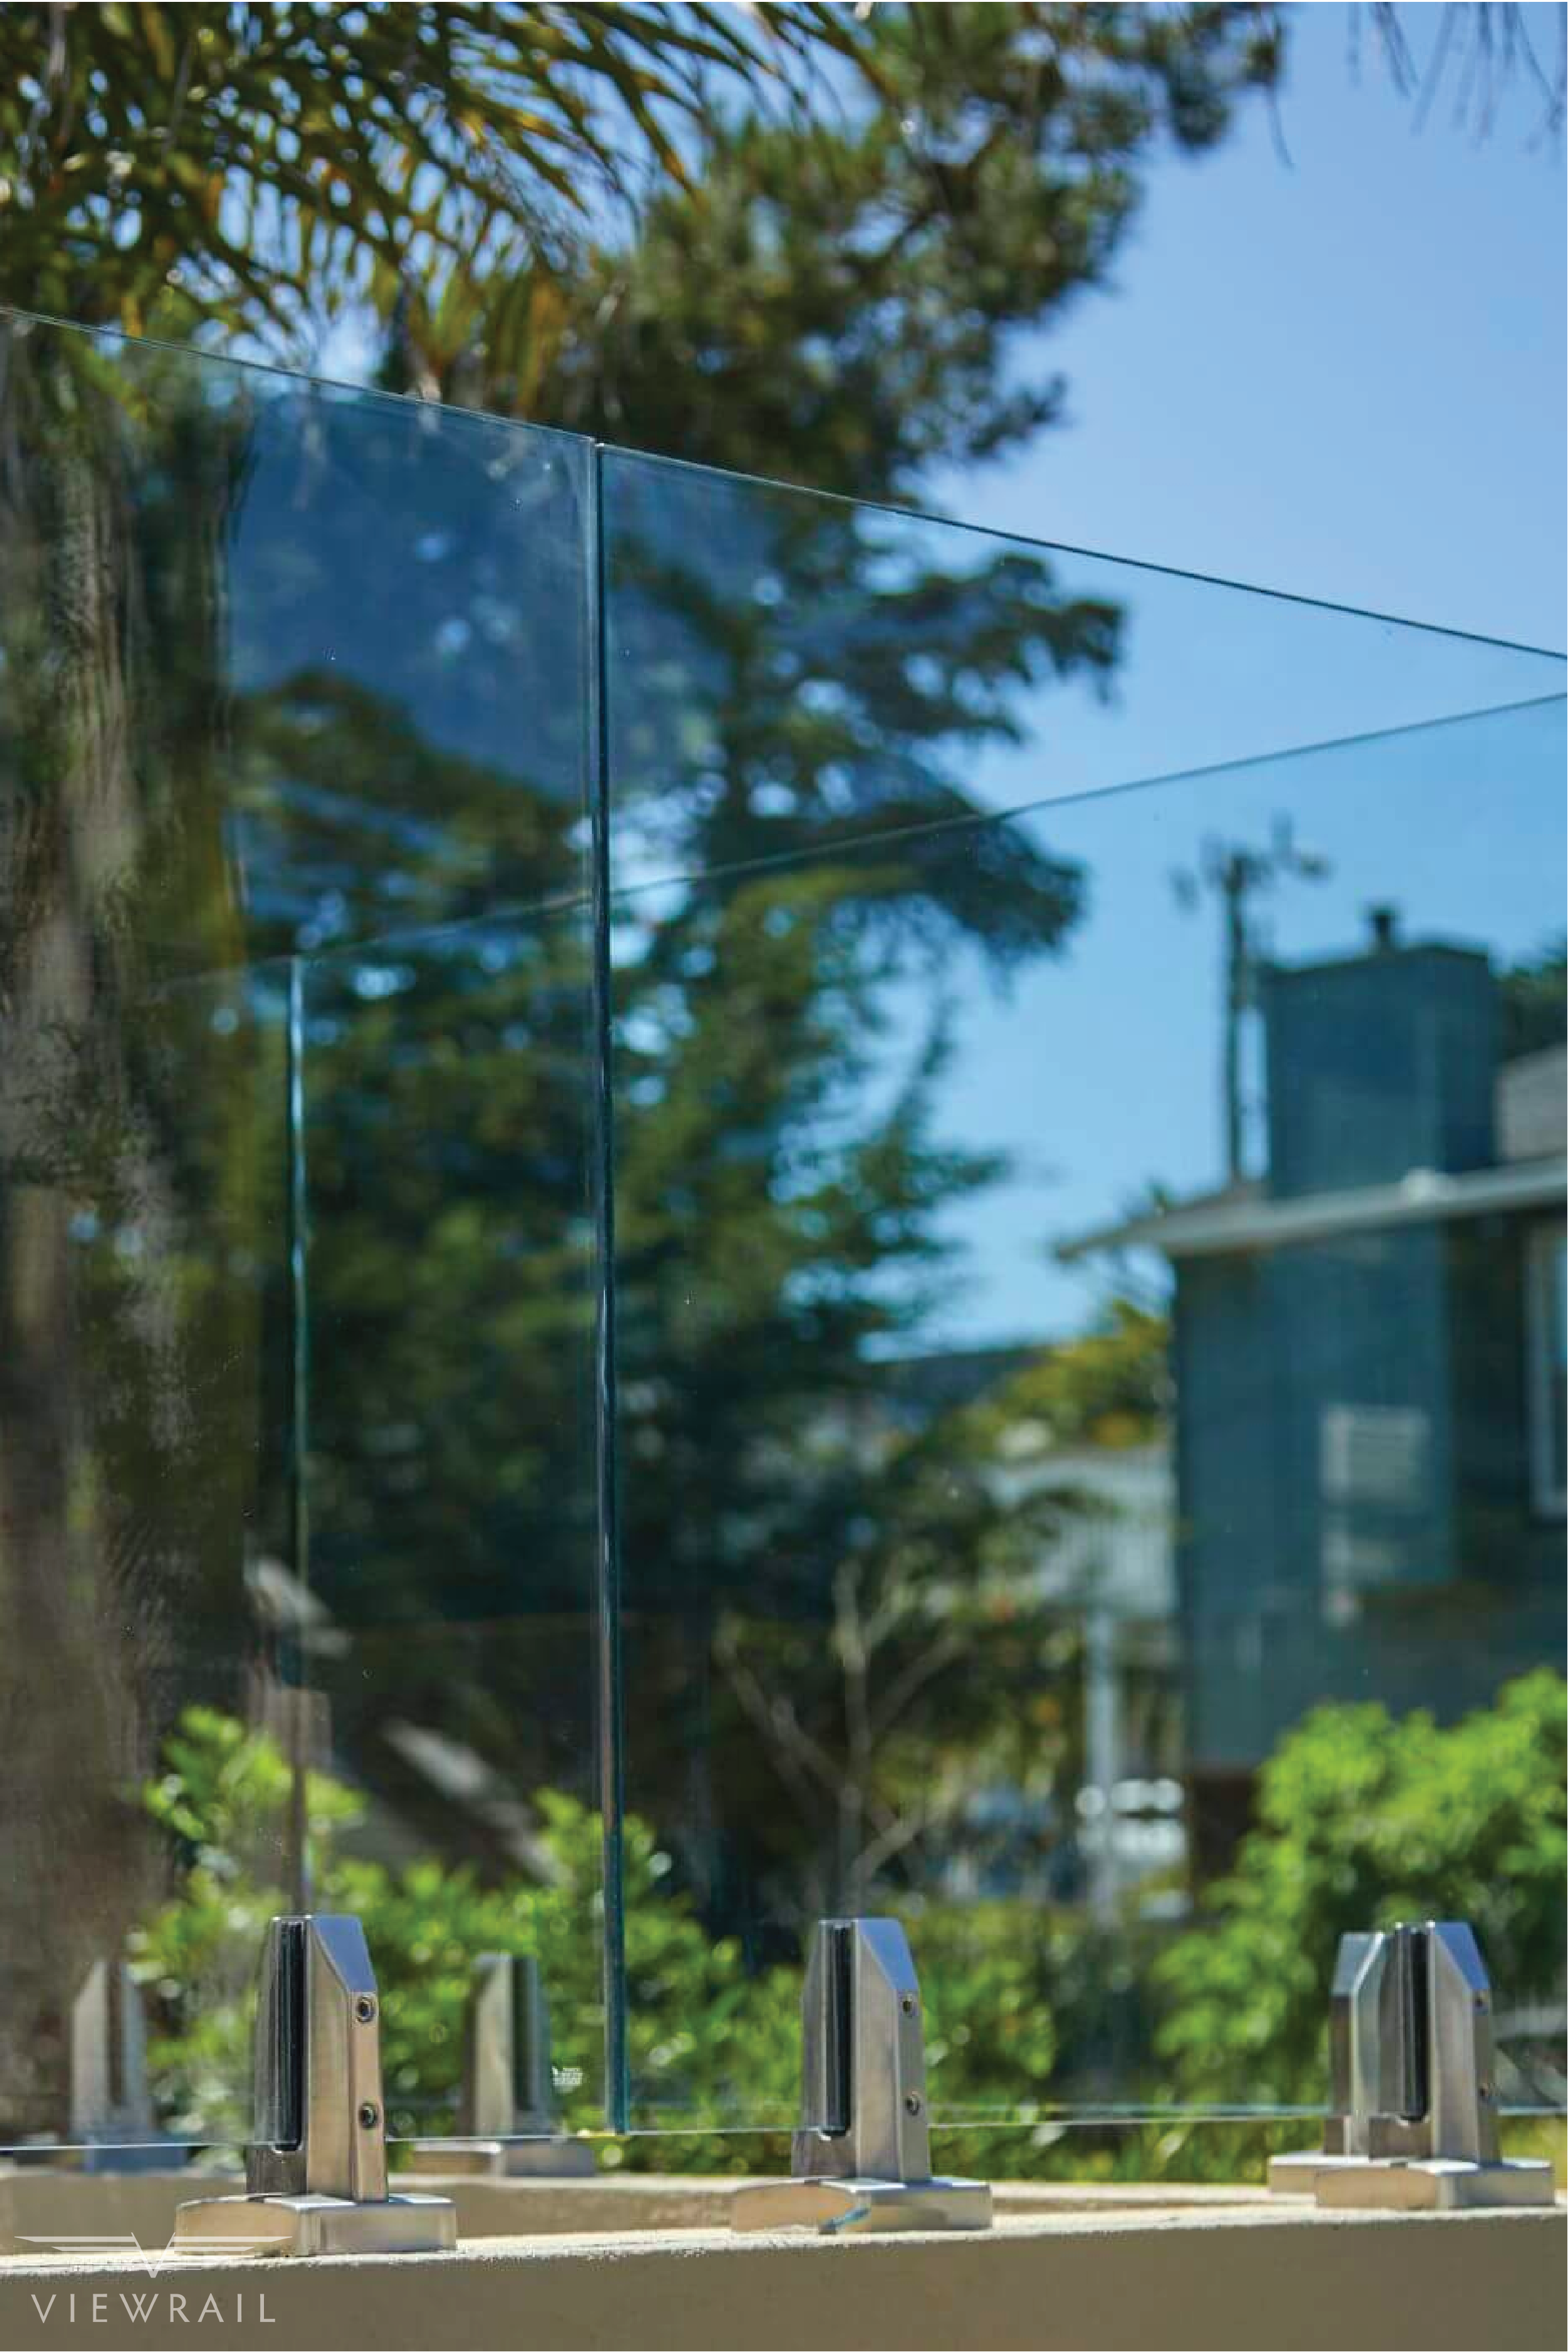 Glass Talon Spigots Viewrail Glass Railing Glass Stairs Glass Railing Deck